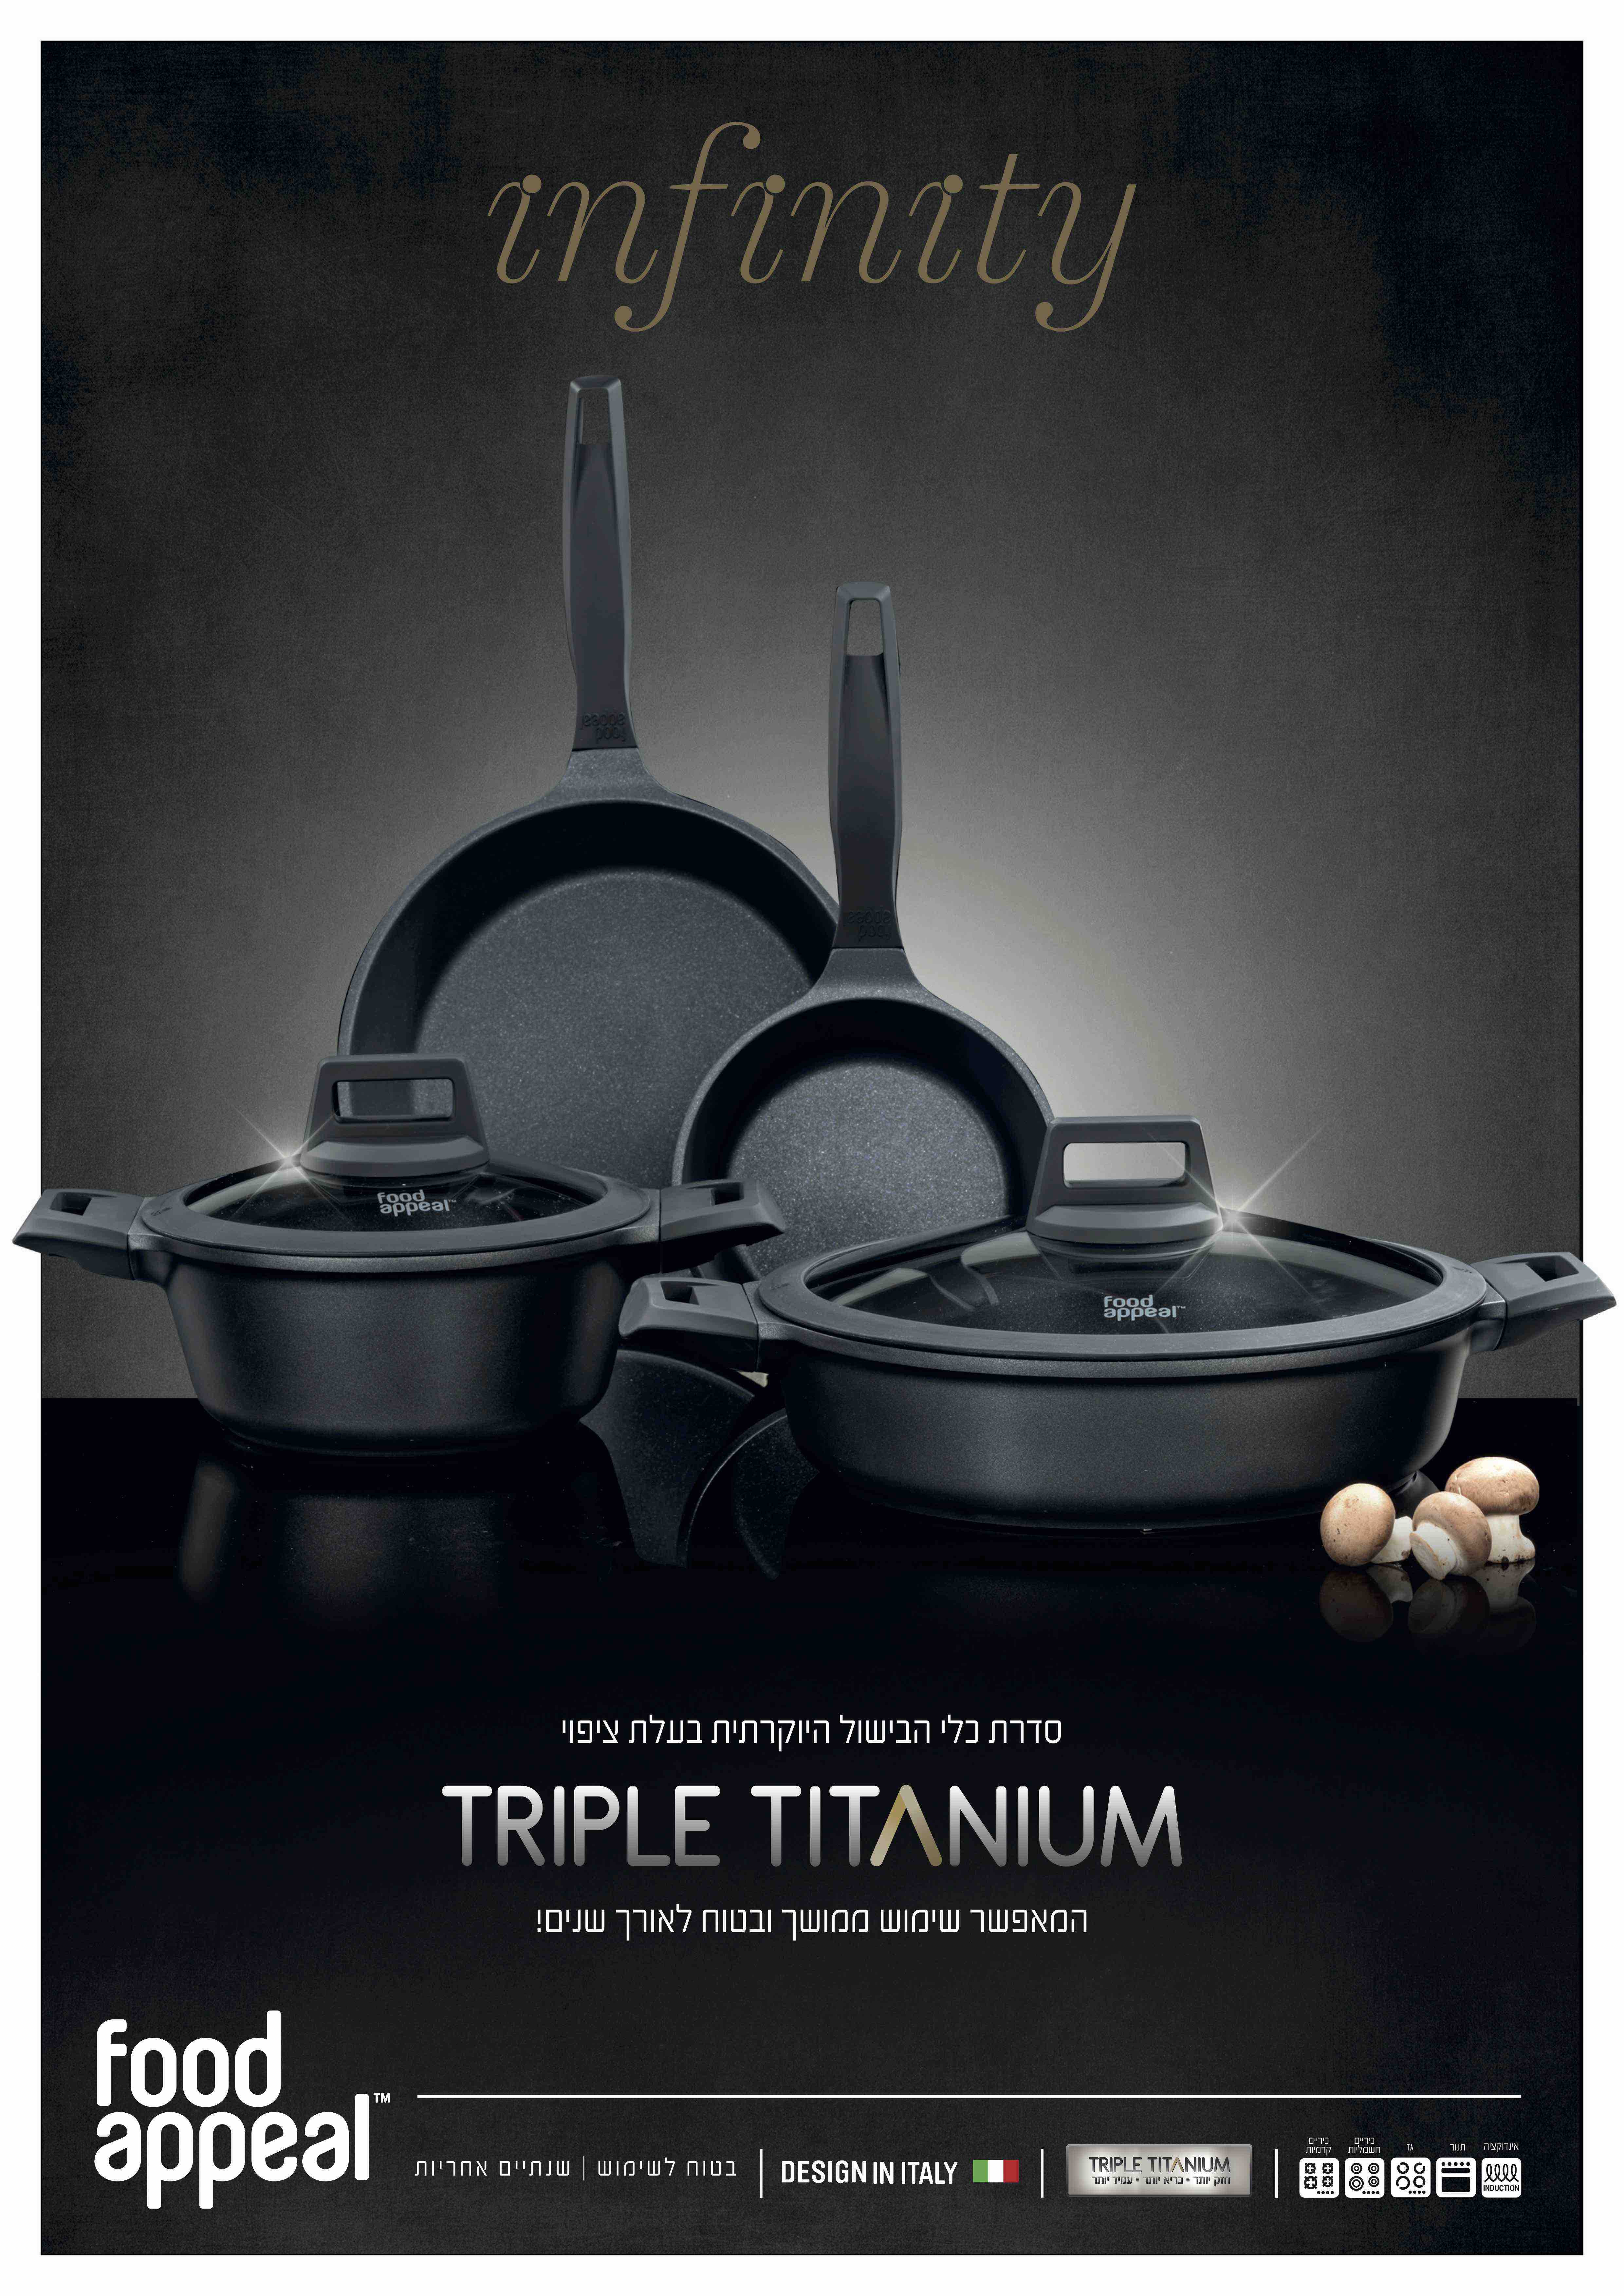 Triple Titanium Infinity Series